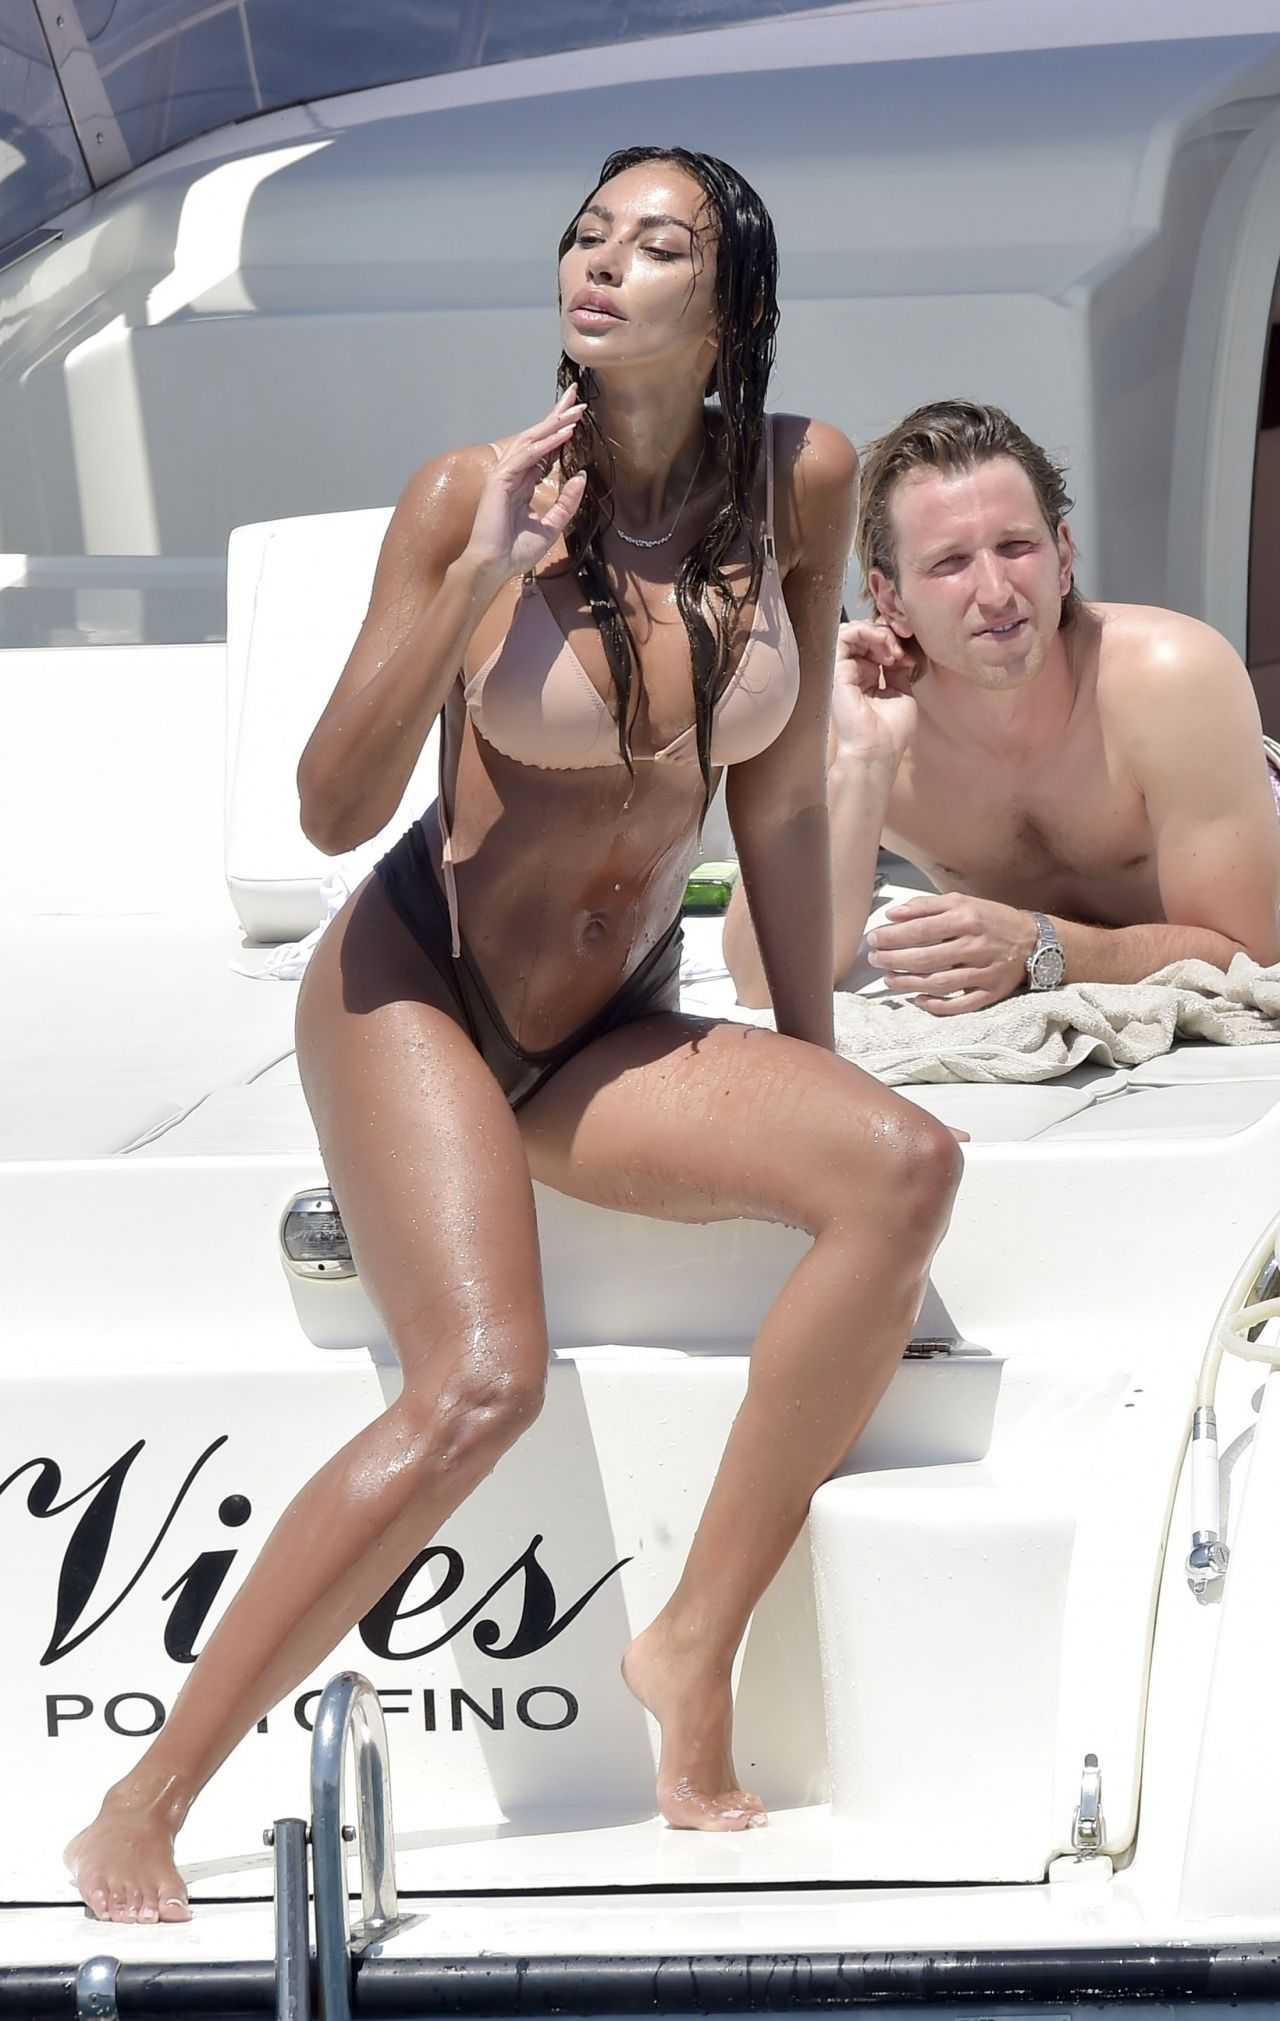 Madalina Ghenea una dea in bikini a Portofino